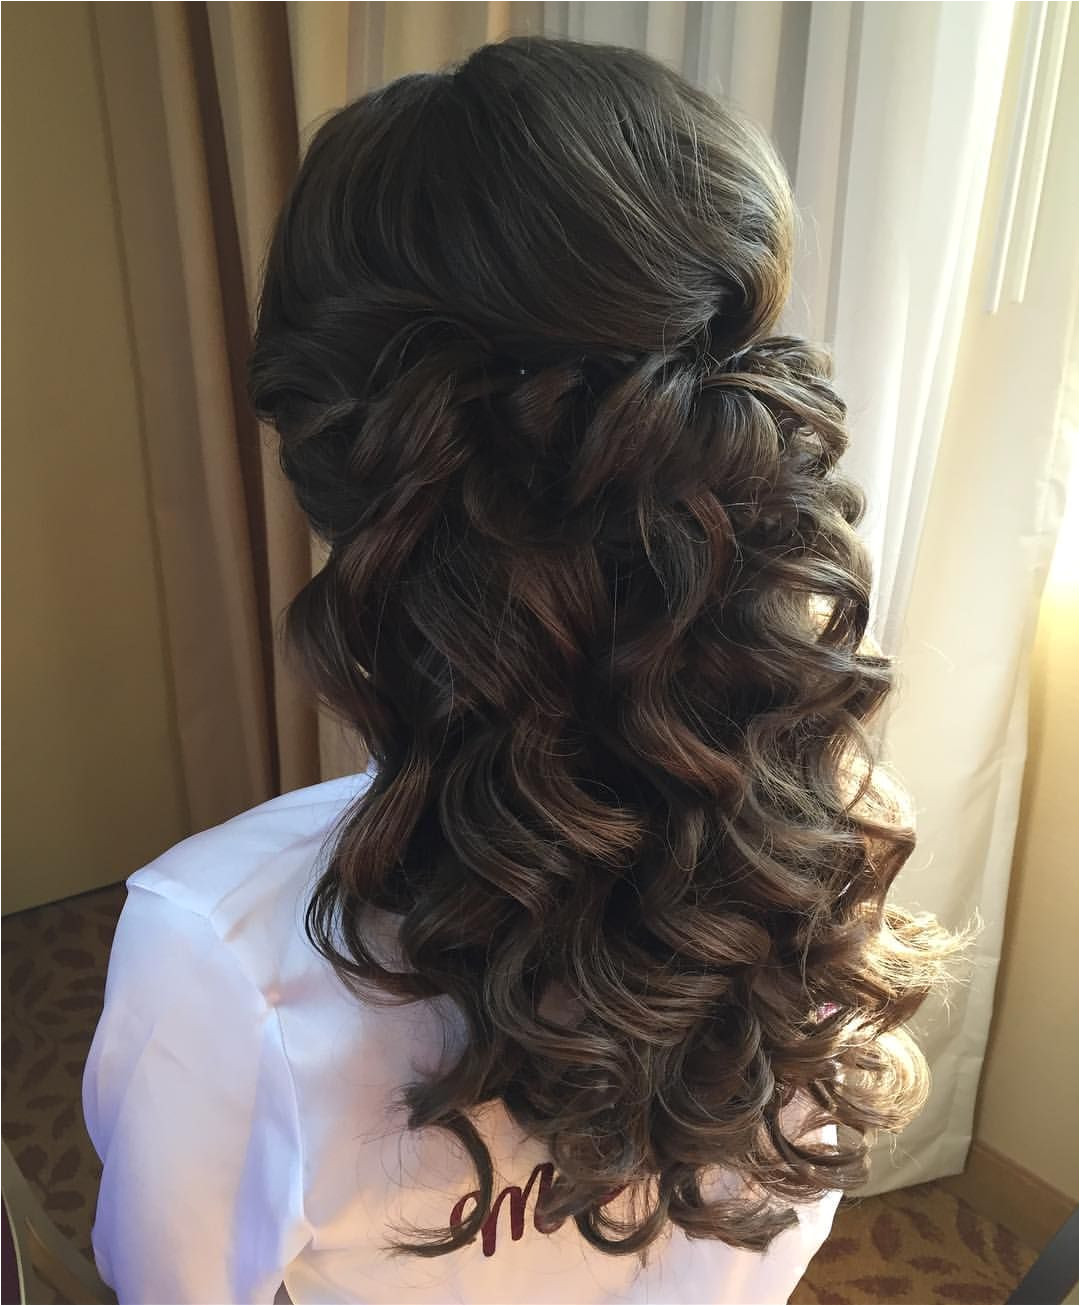 128 Likes 1 ments Bridal Hair Specialist tiffanyjoydesigns on Instagram